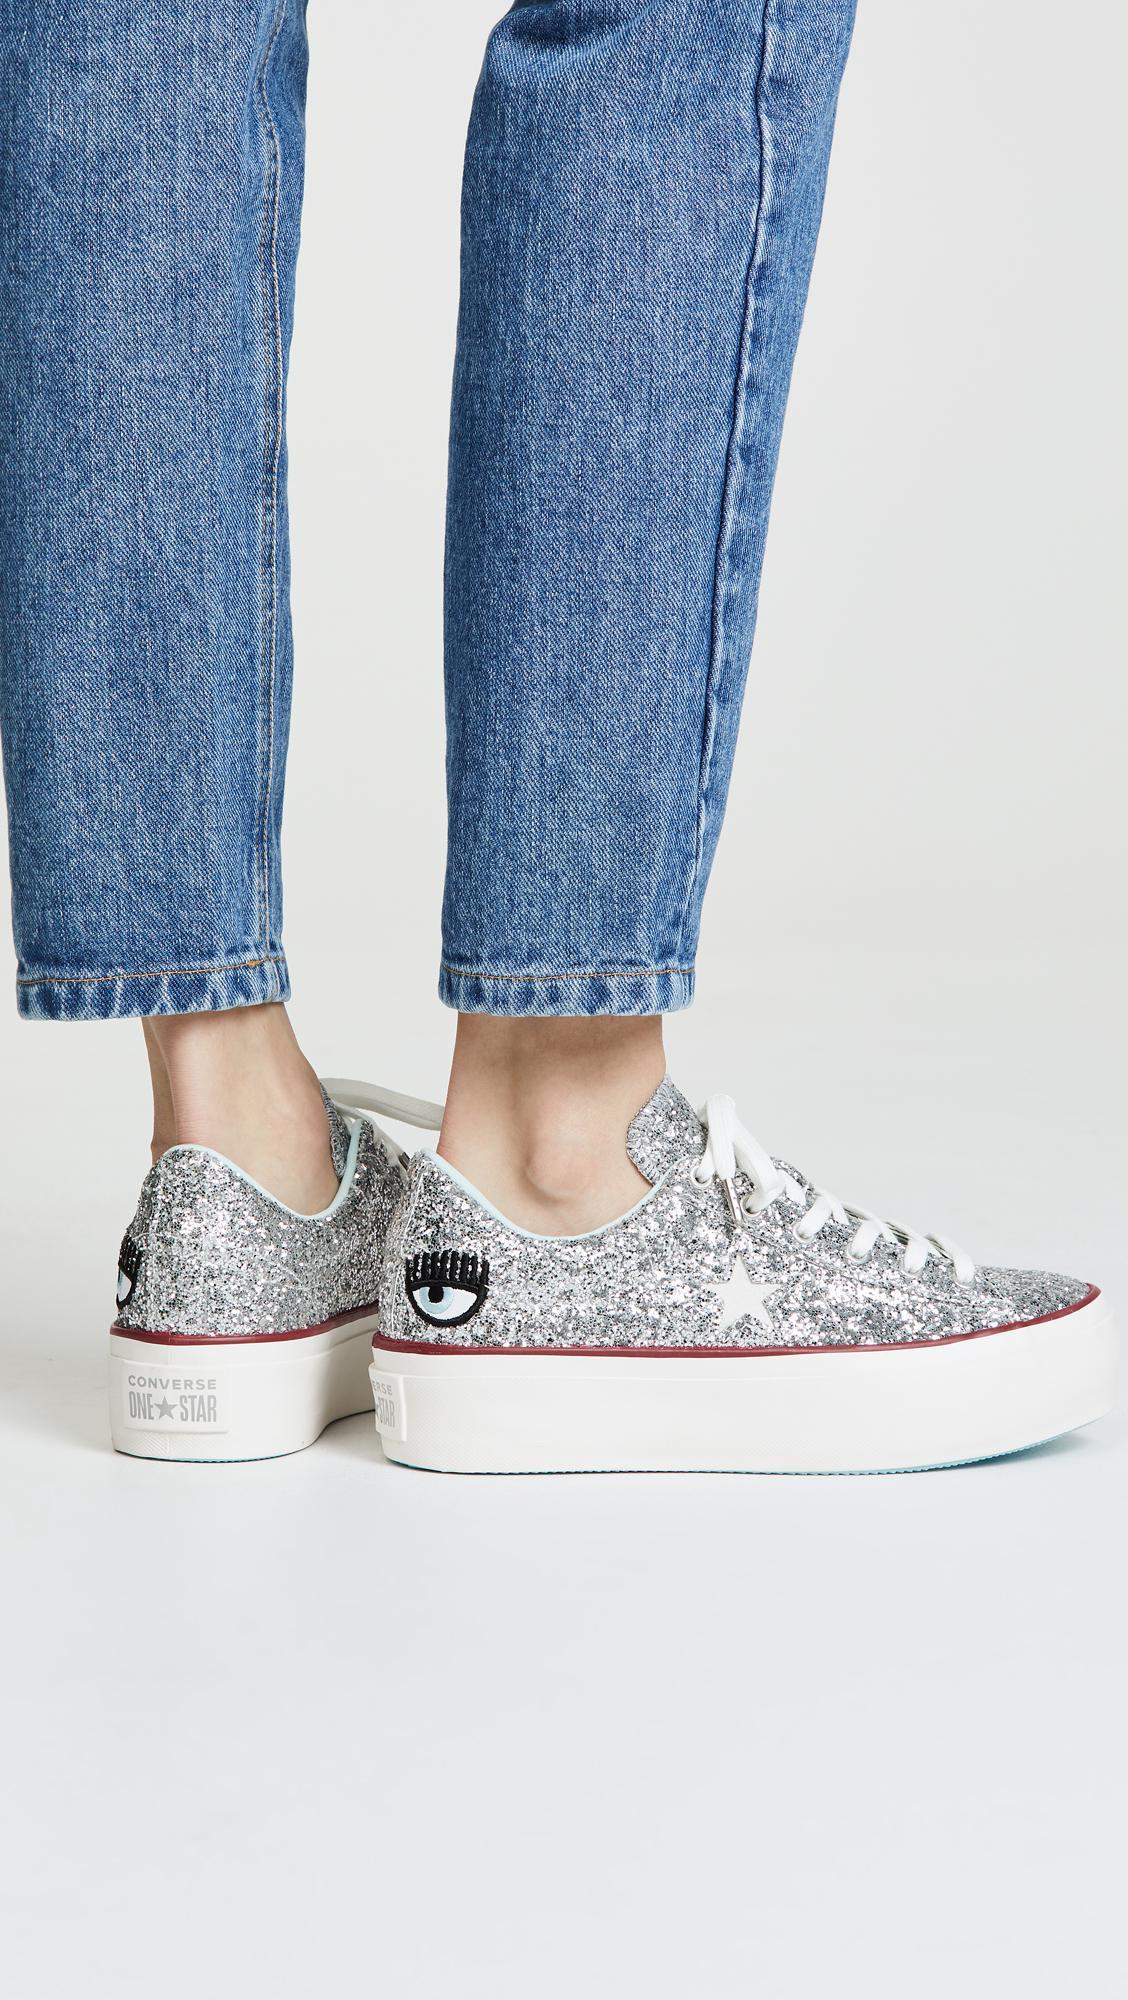 a3bac9df968874 Lyst - Converse X Chiara Ferragni Sneakers in Metallic